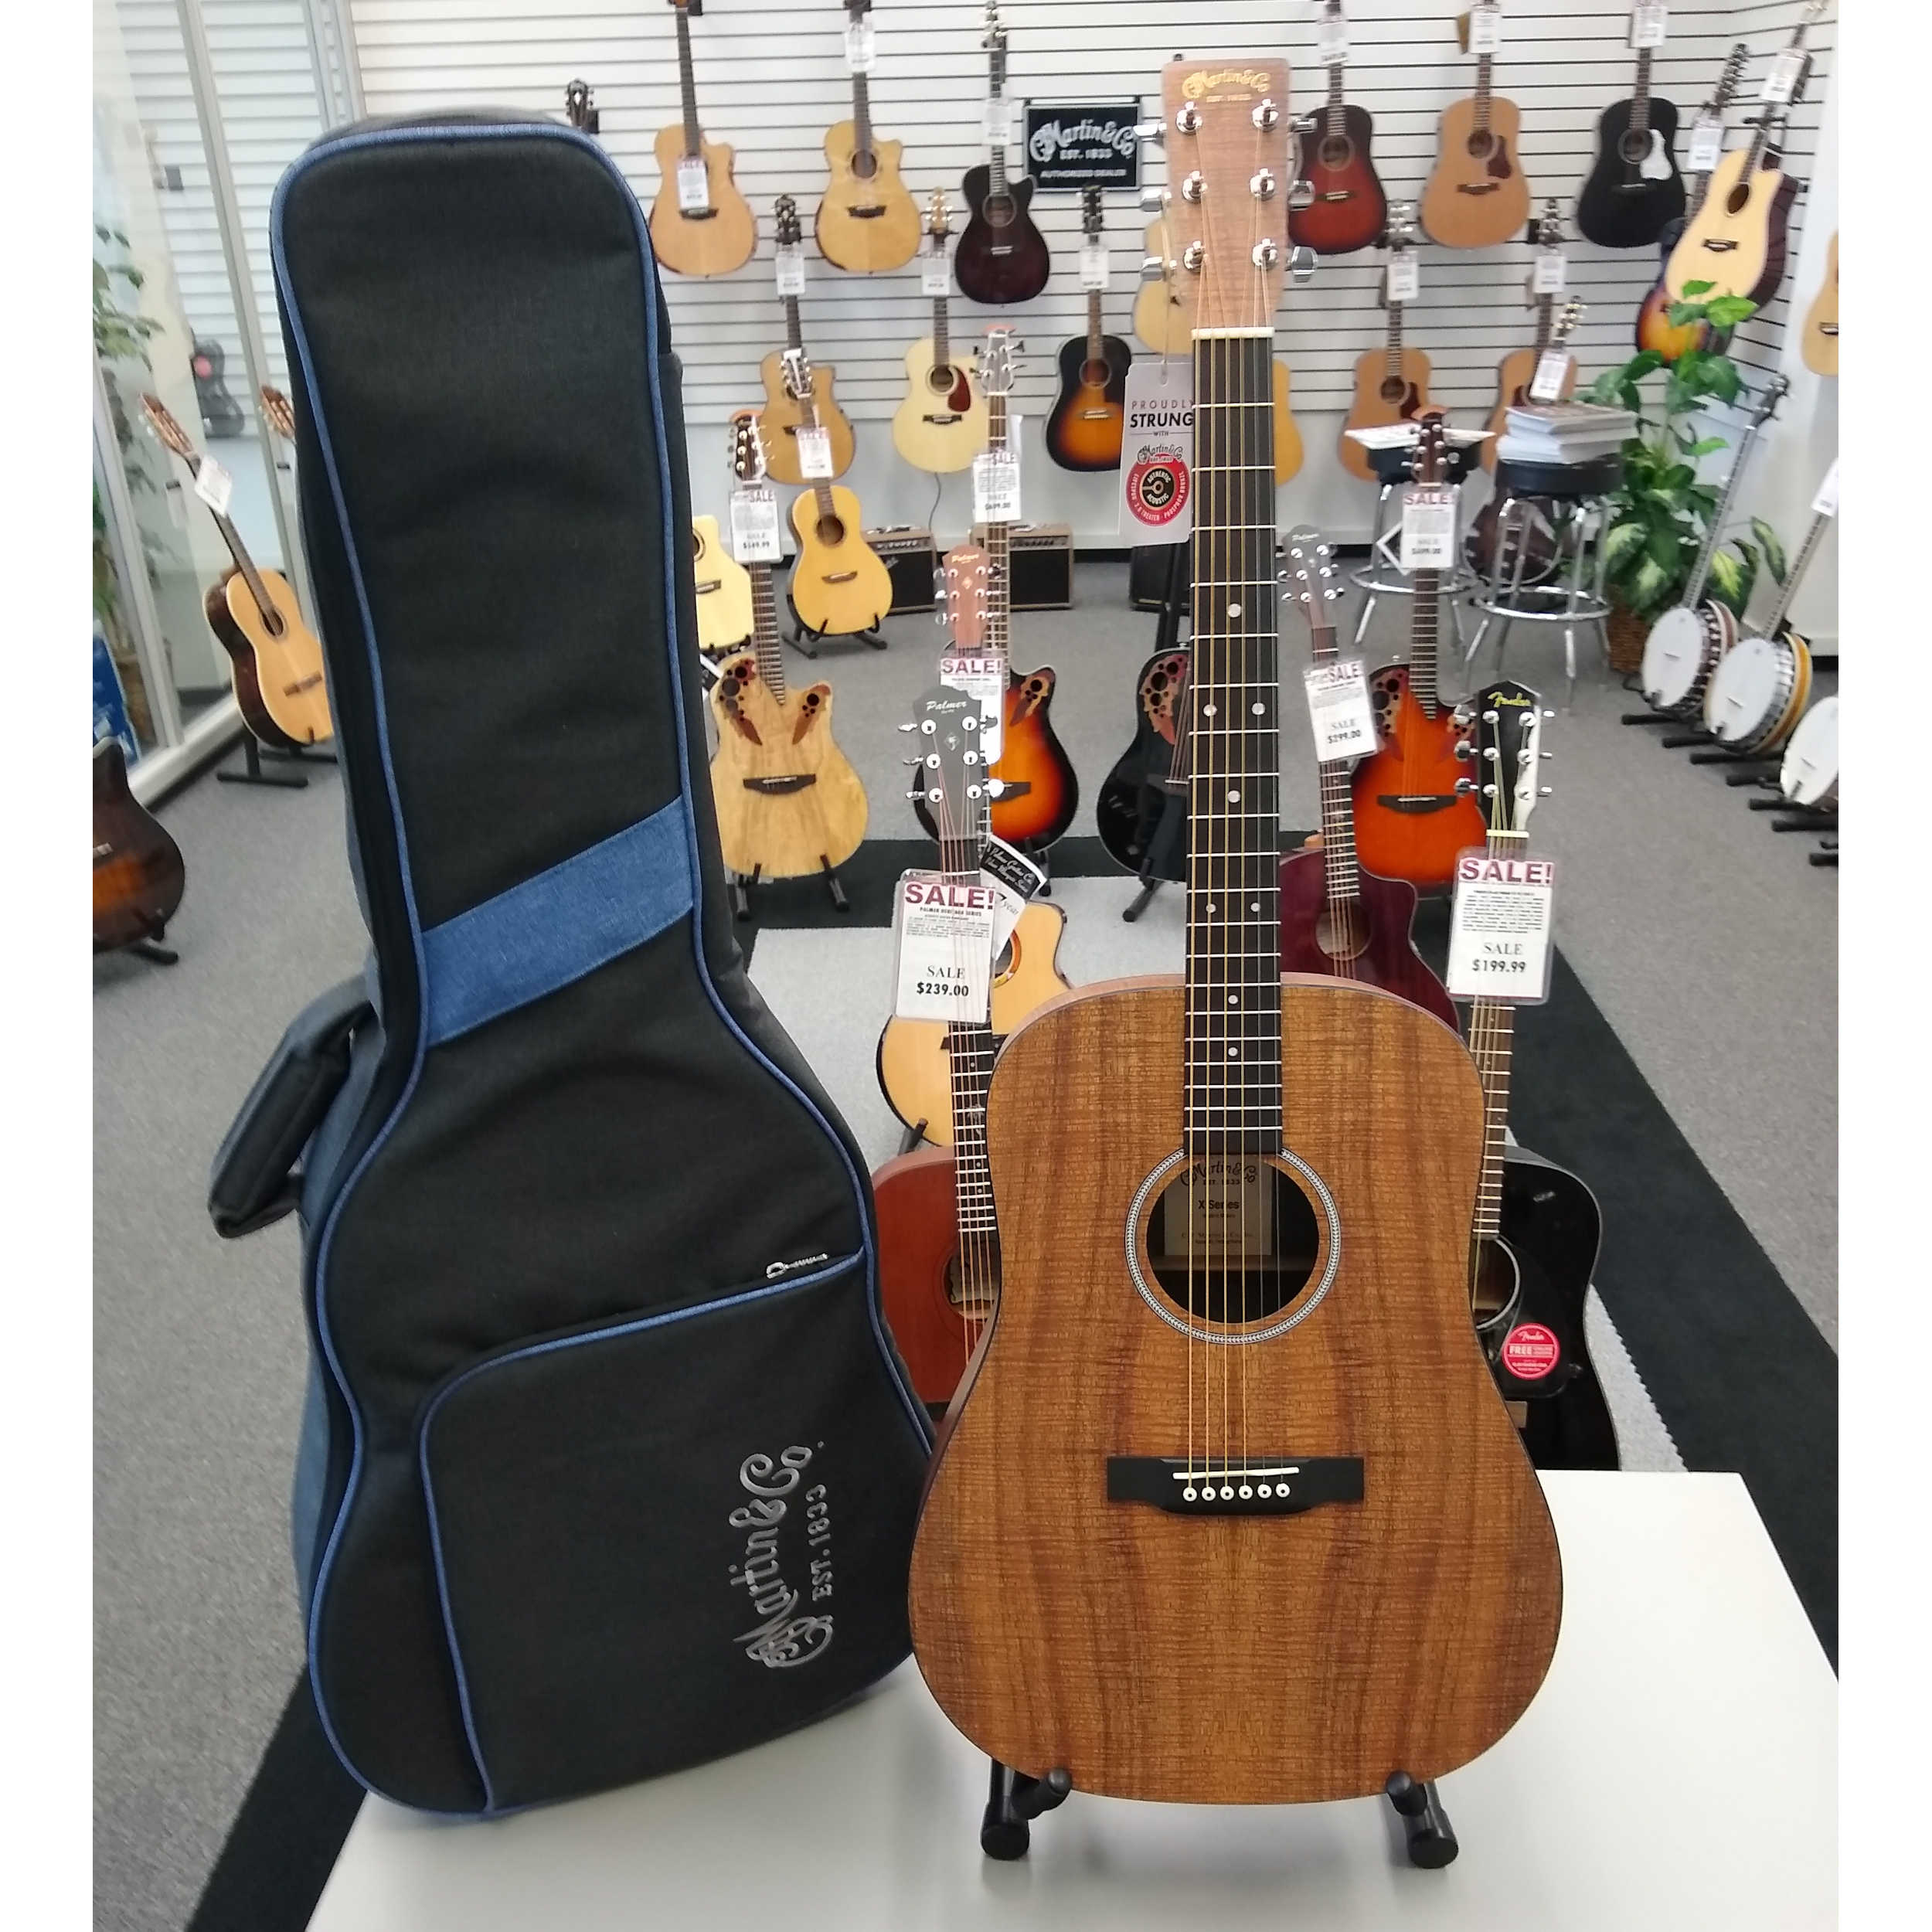 Martin DX1E KOA Acoustic Guitar